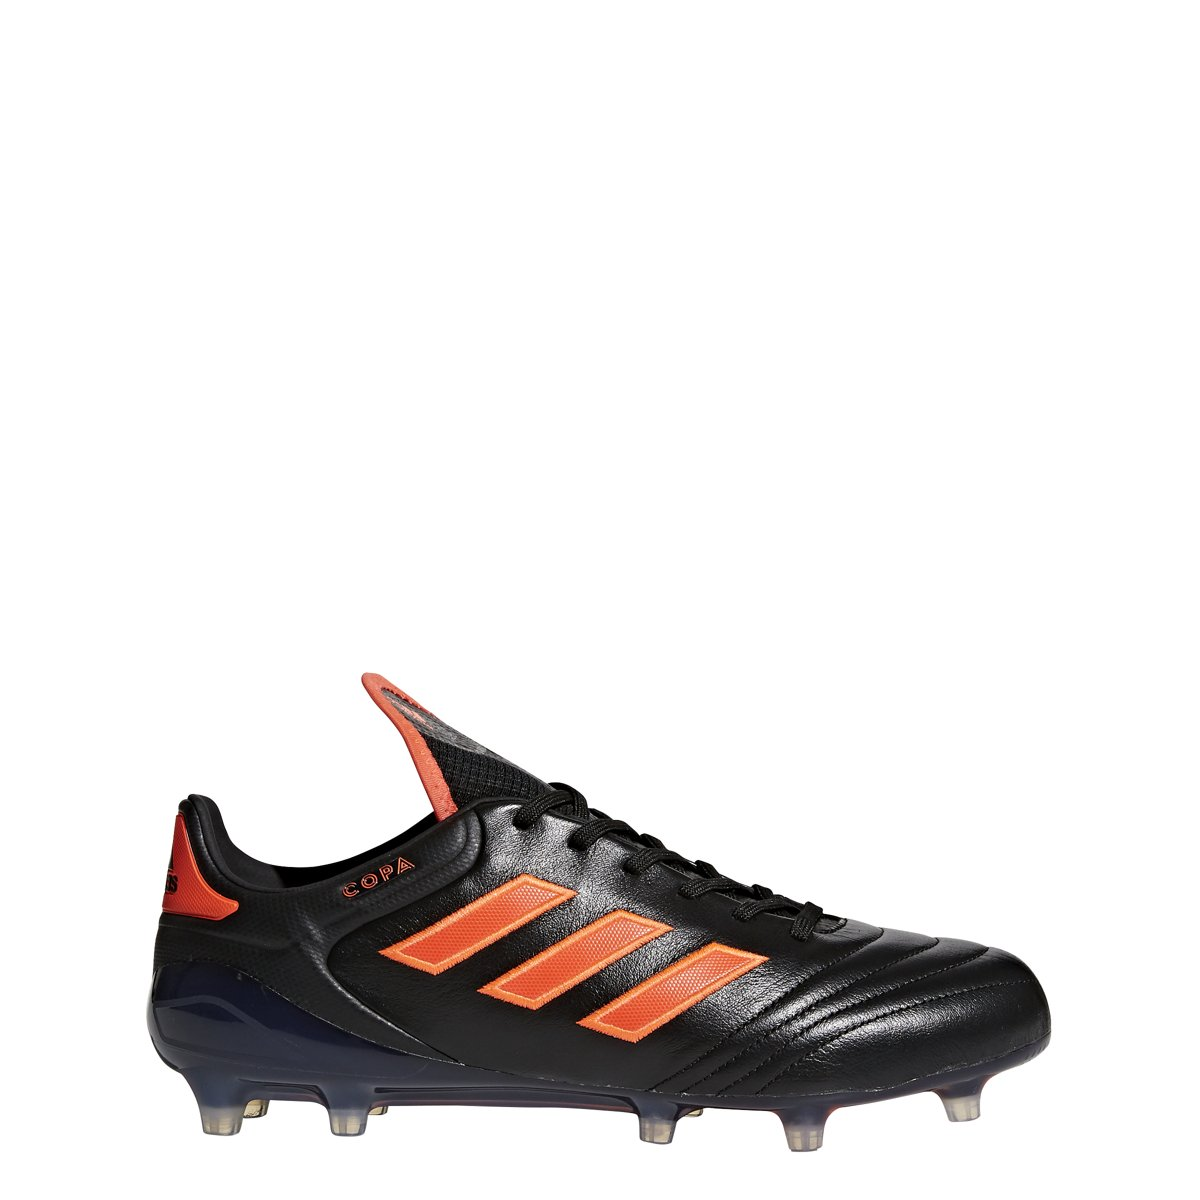 adidas Men's Copa 17.1 FG Soccer Cleat (Black, Solar Red) B076DGZ9Q7 12 D(M) US|Black, Solar Red, Solar Red